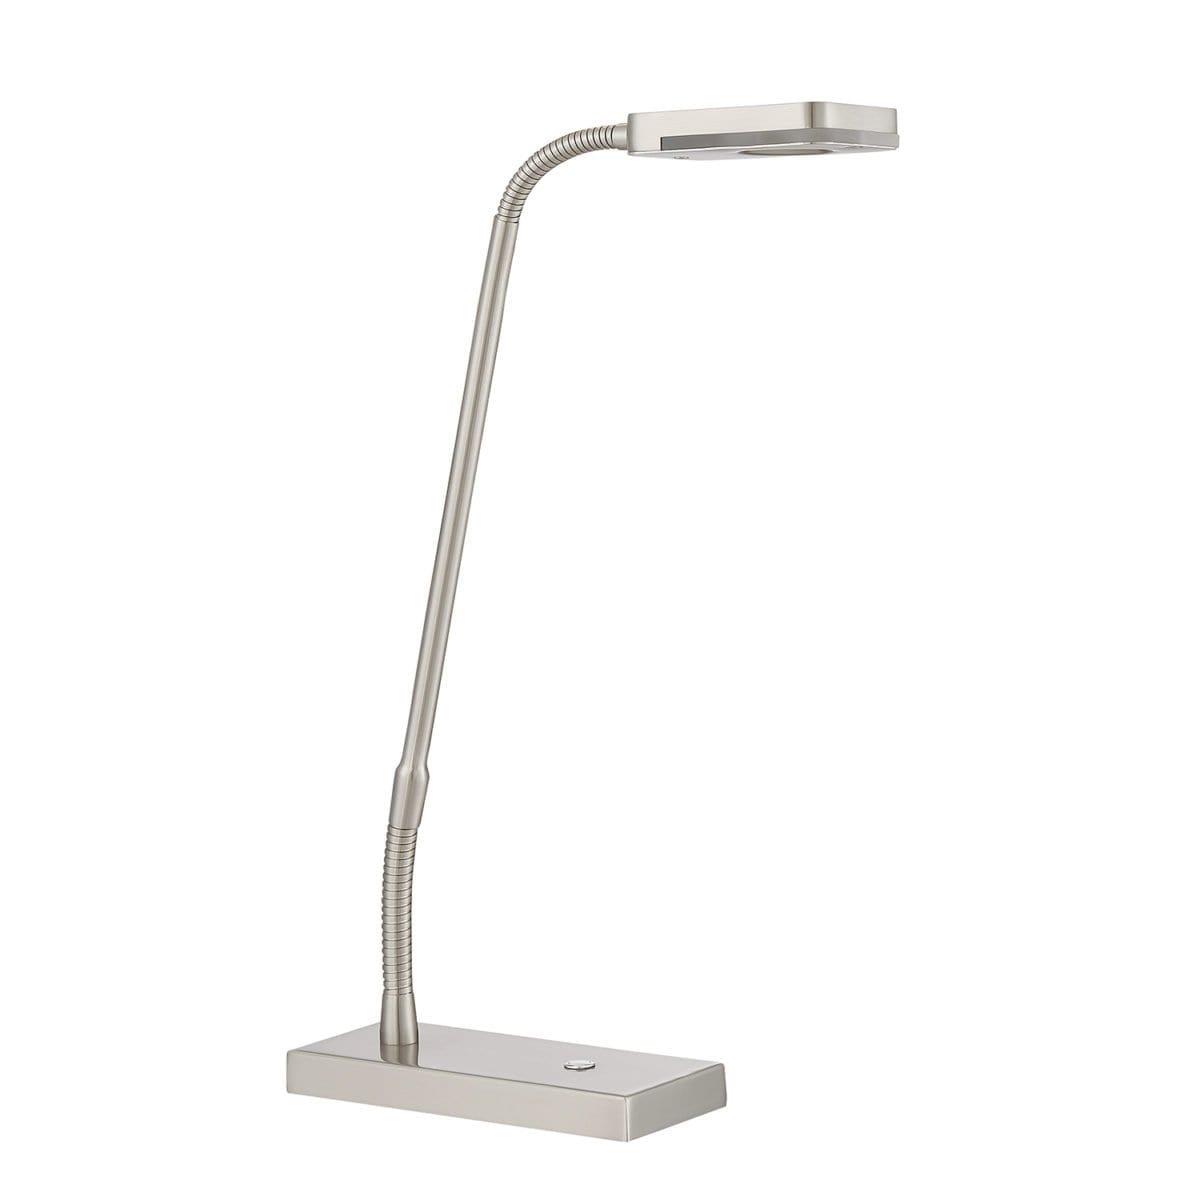 148 PTL 4094 SN LED Table Lamp Regular Price $147.99